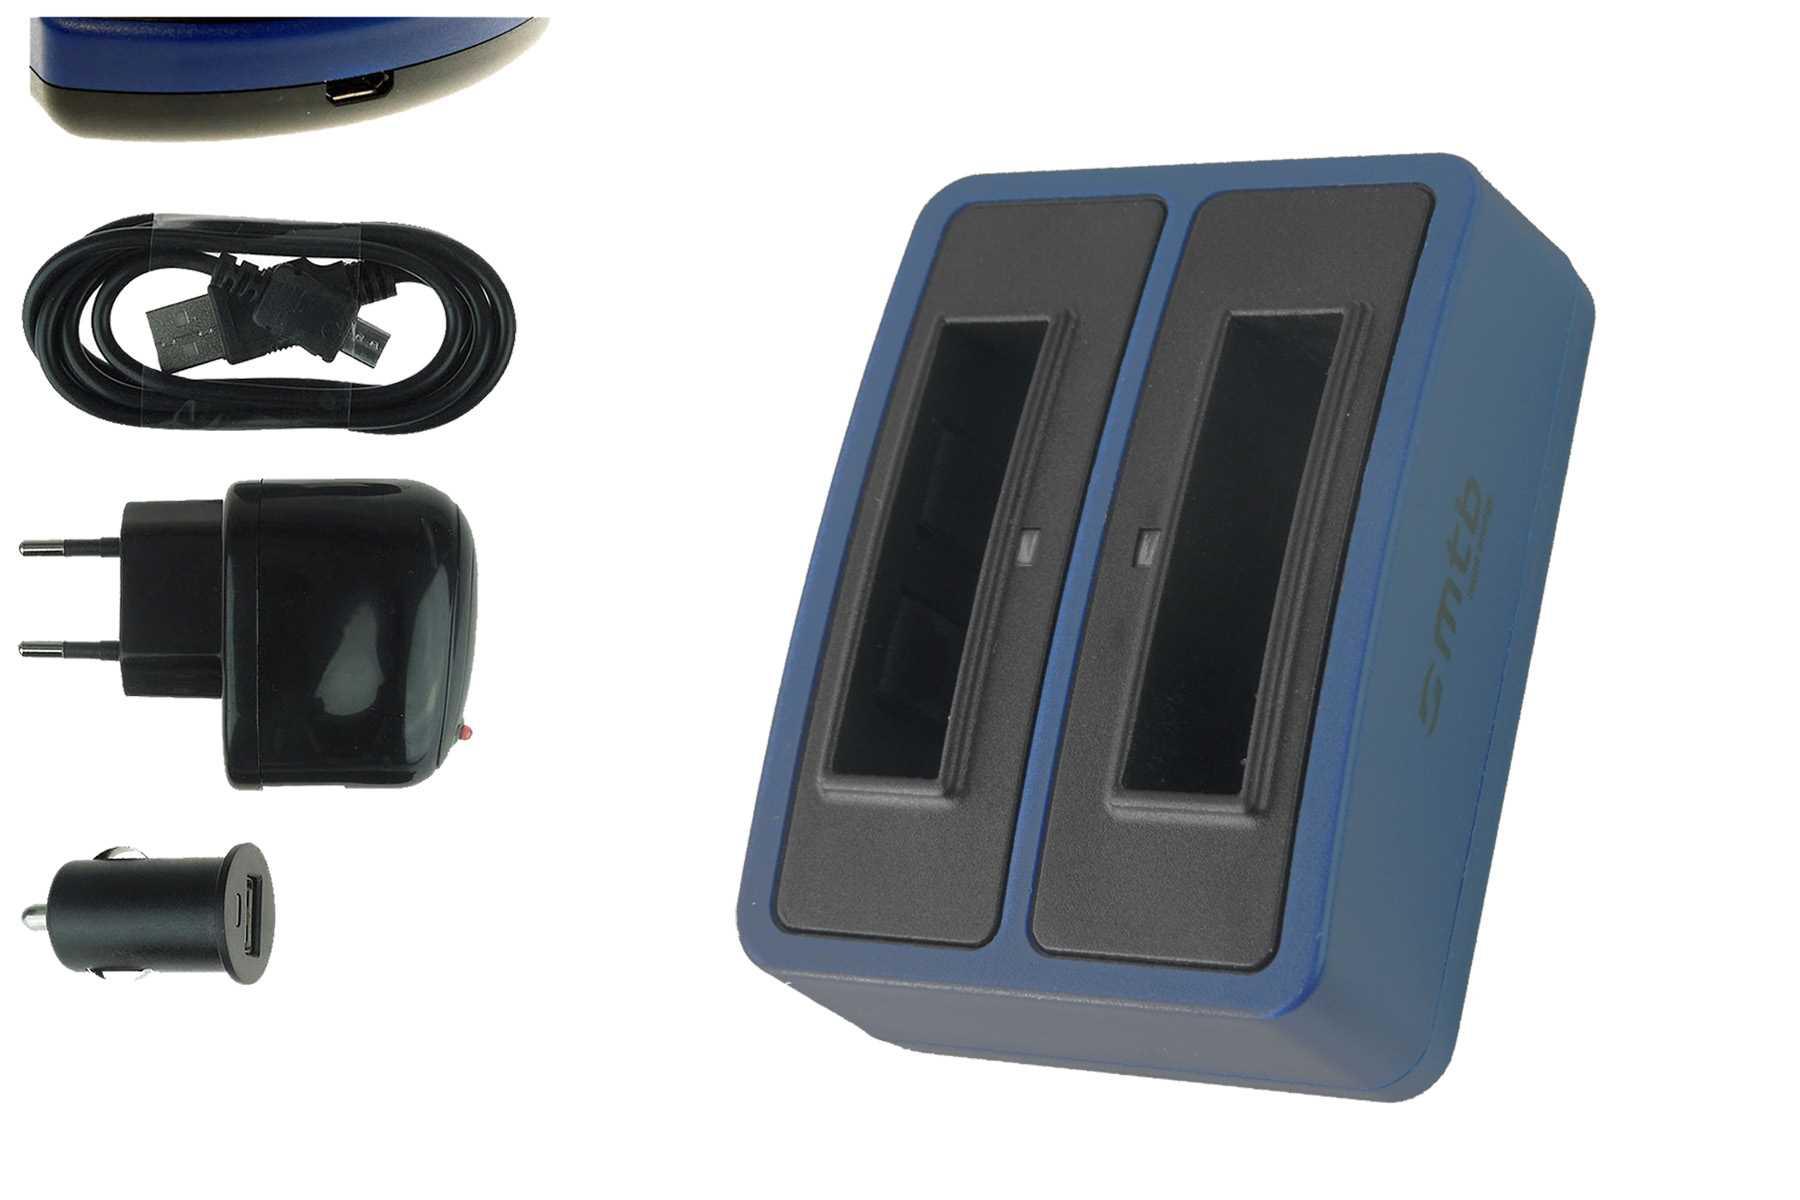 dual akku ladeger t usb rl410b f r maginon action cam ac. Black Bedroom Furniture Sets. Home Design Ideas